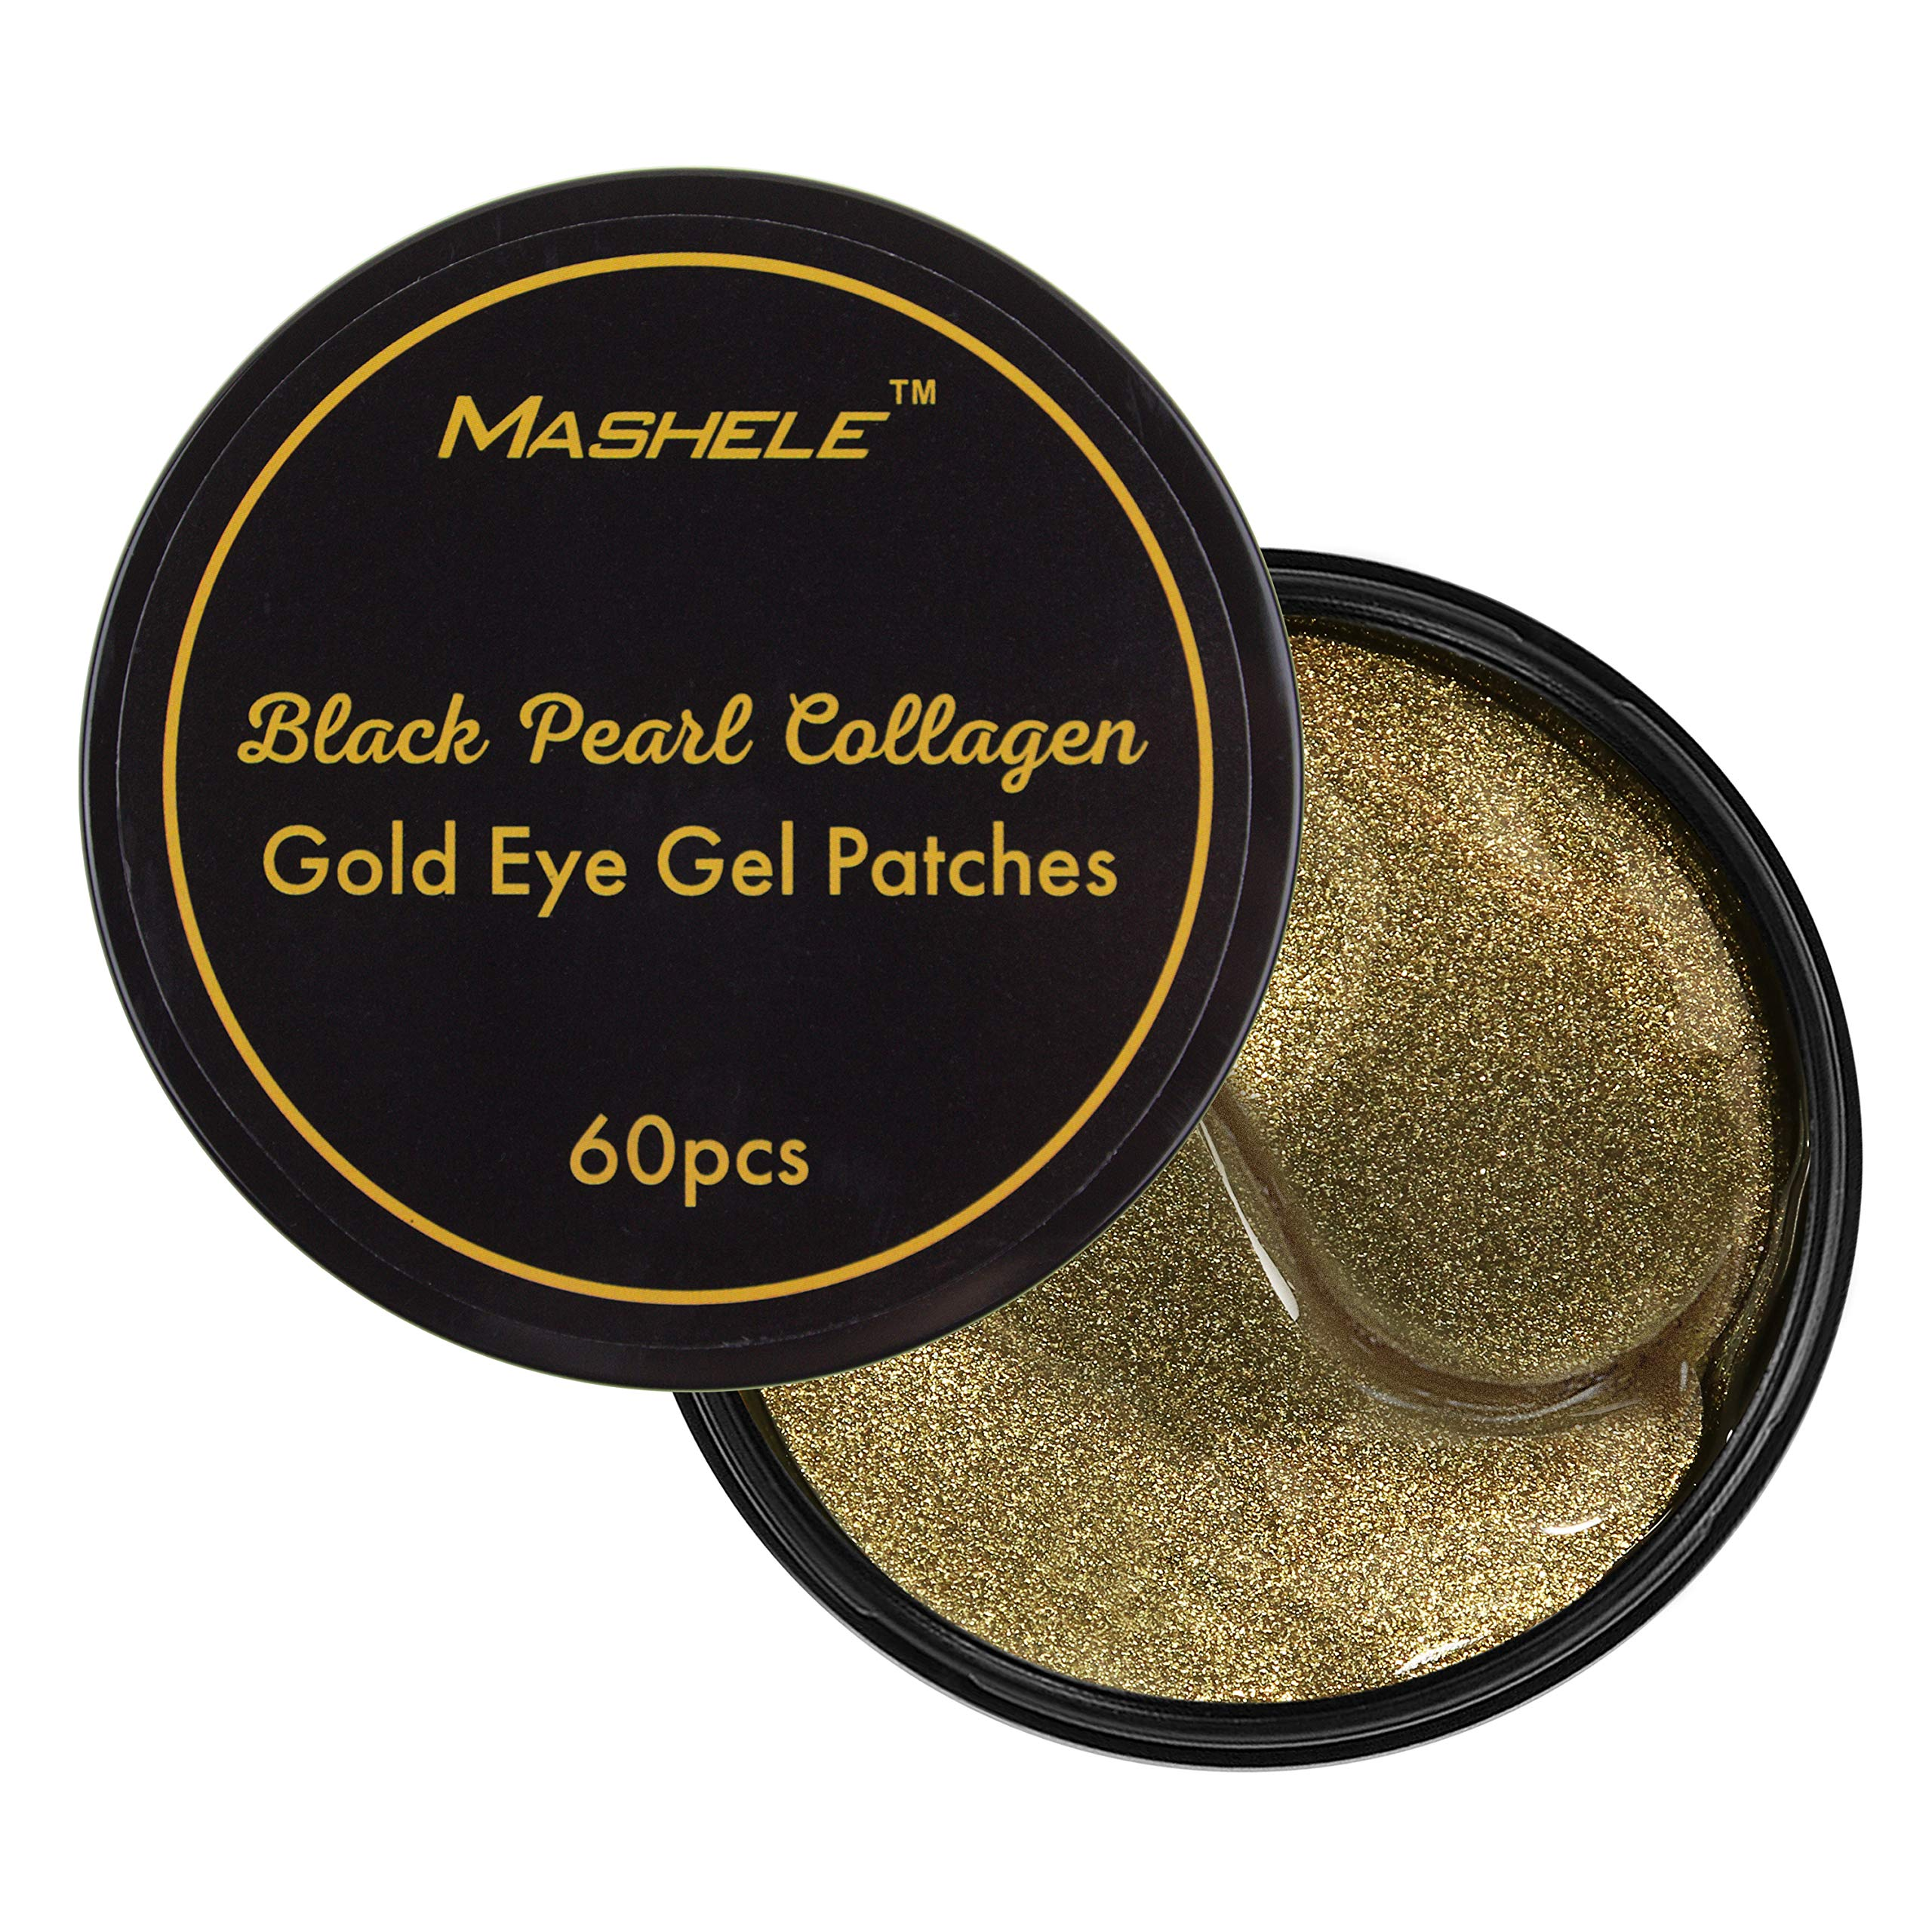 MASHELE Korean 60 psc Black Pearl Gold Collagen Eye Patch | Anti Wrinkle Eye Mask Gel Sleep Mask Dark Circles Under Eye Bags Treatment | All-Natural Eye Care Gel for Women and Men eye-pad